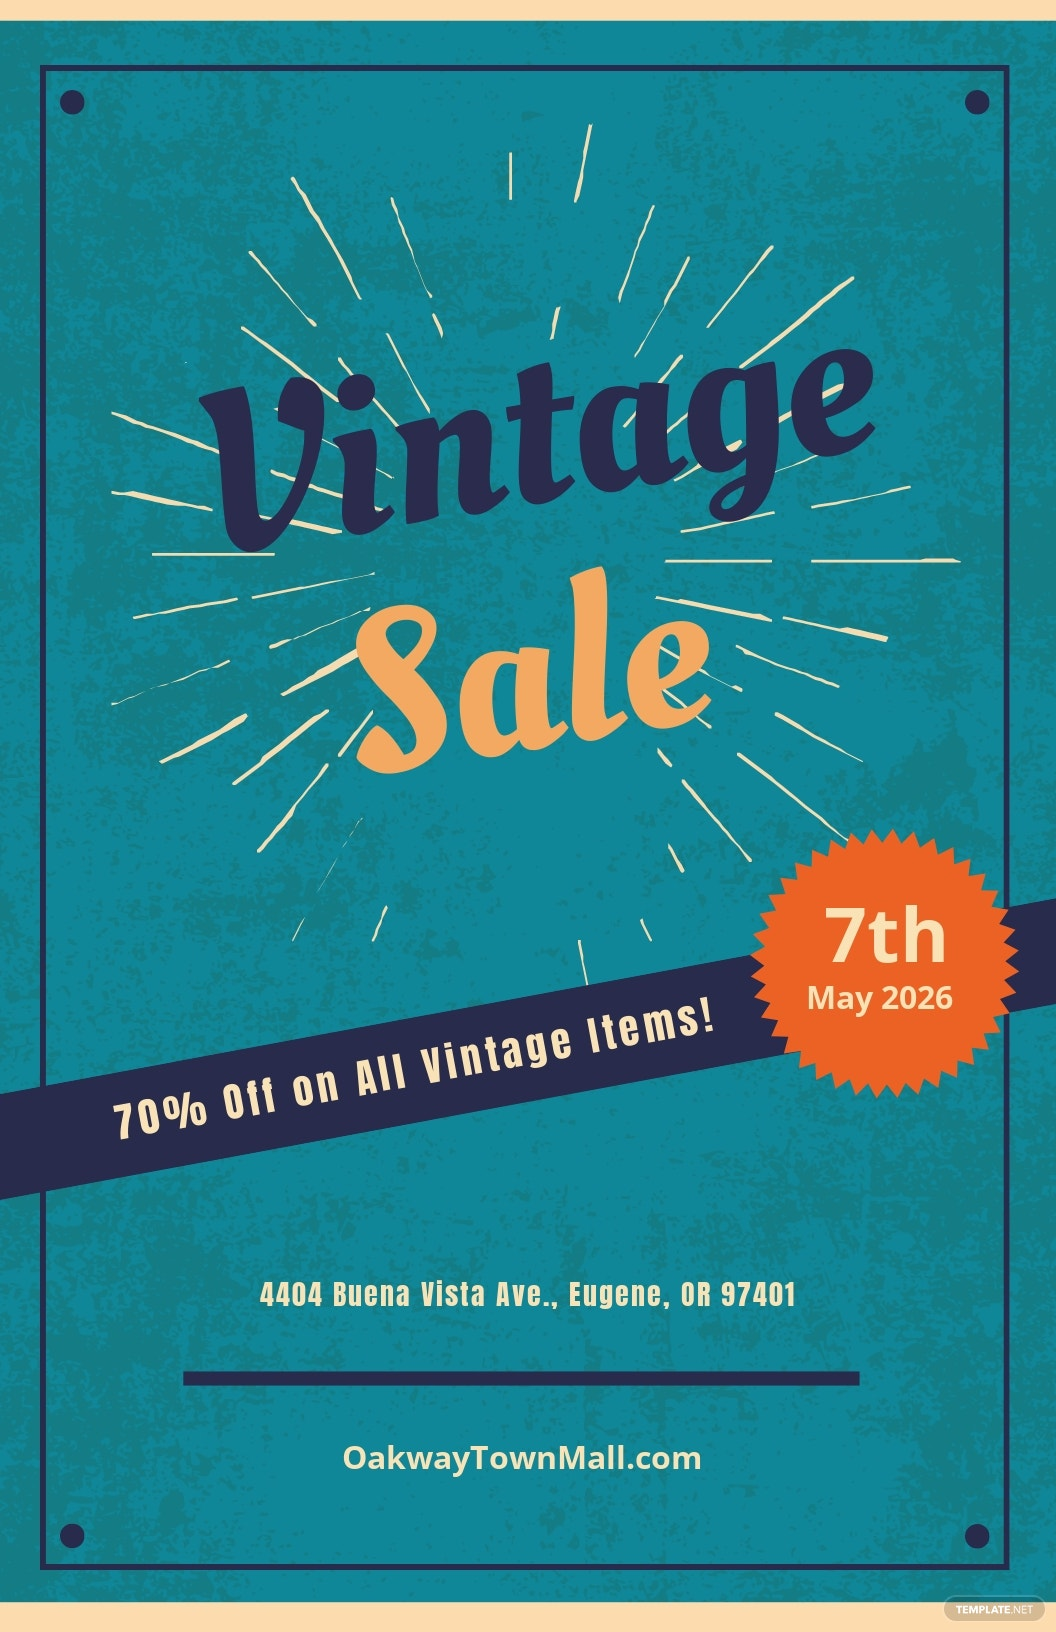 Vintage Sale Poster Template.jpe